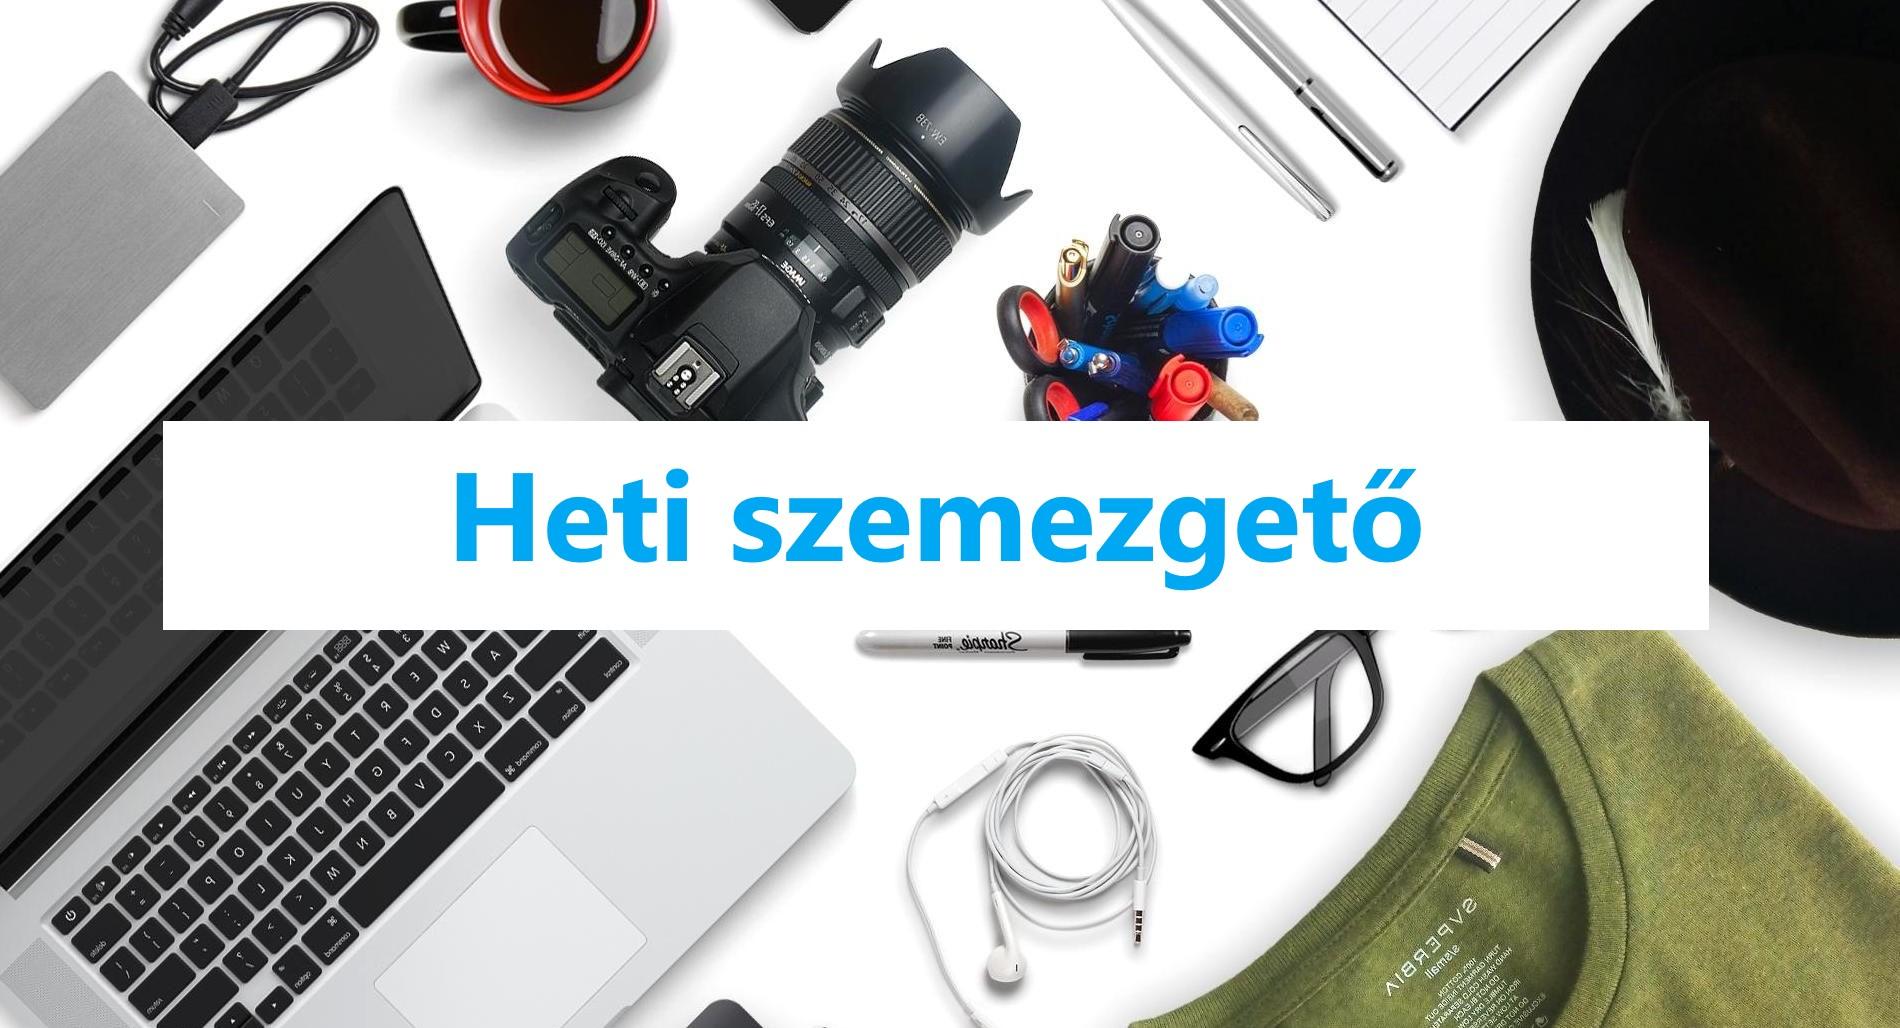 heti_szemezgeto_uj_70.jpg